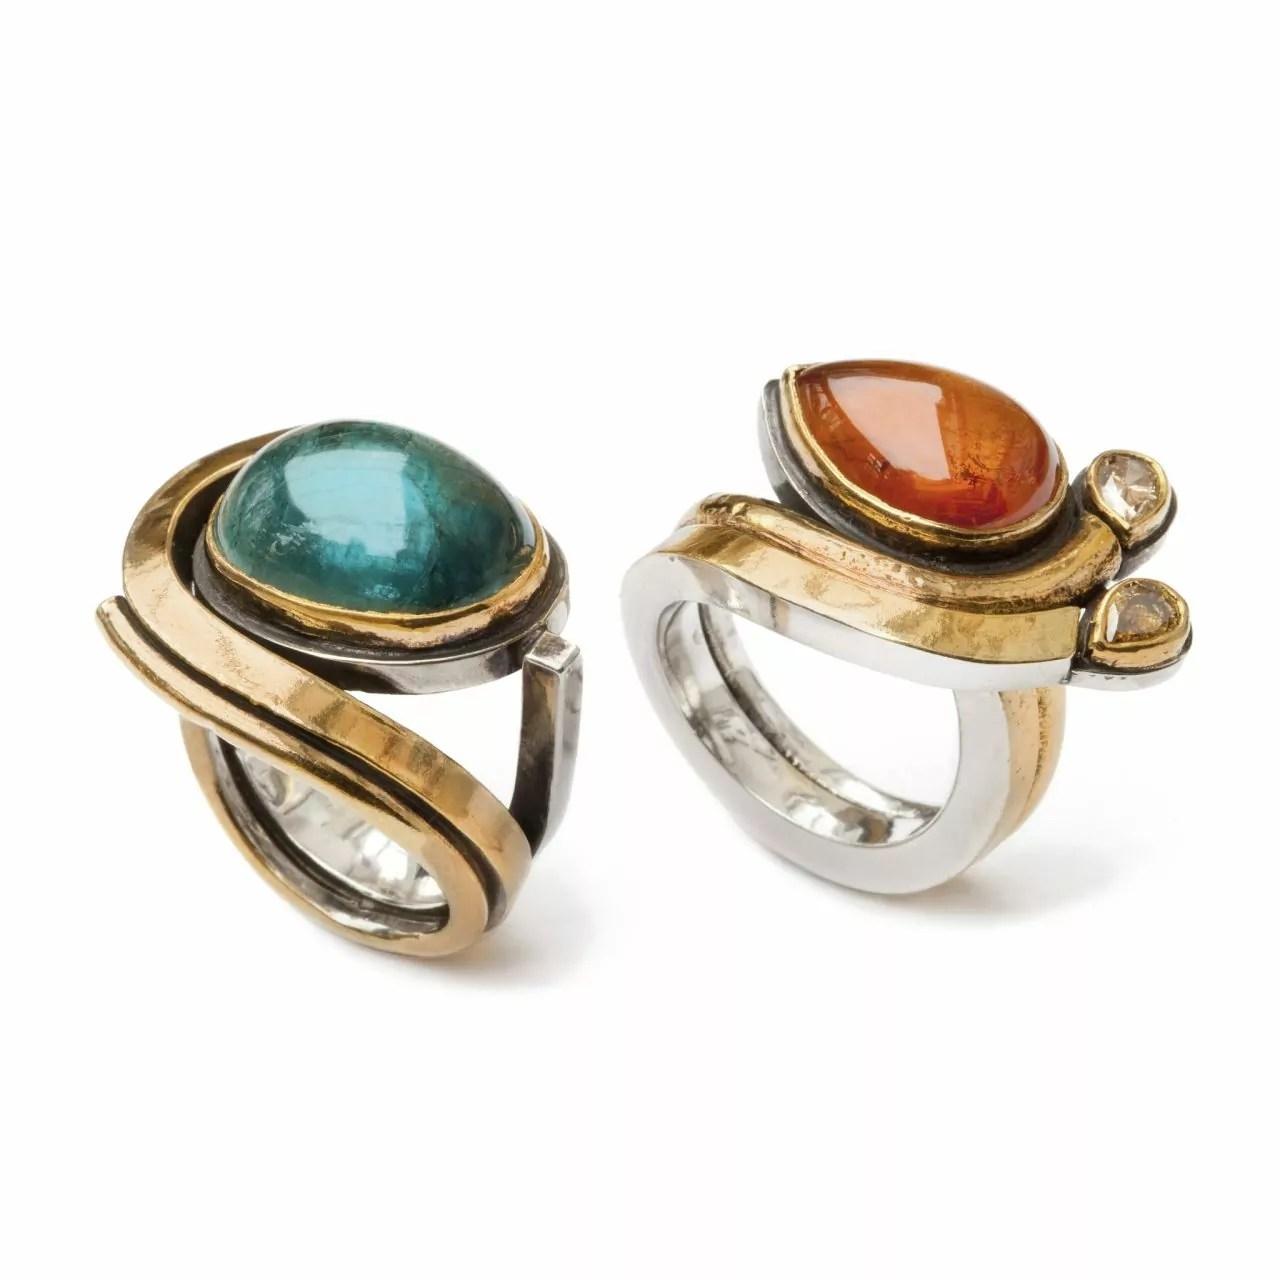 Rings with Tourmaline, Mandarin Garnet and Diamonds